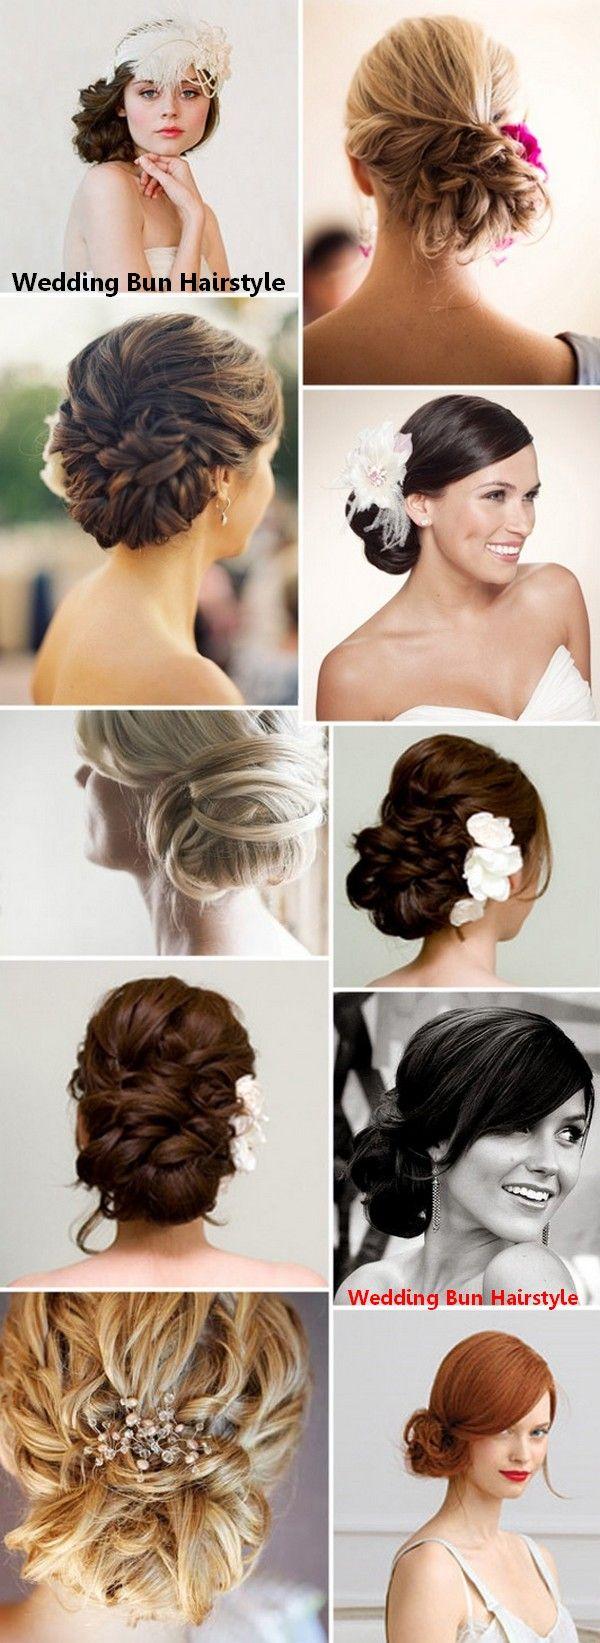 of the most popular wedding pins wedding bun hairstyles